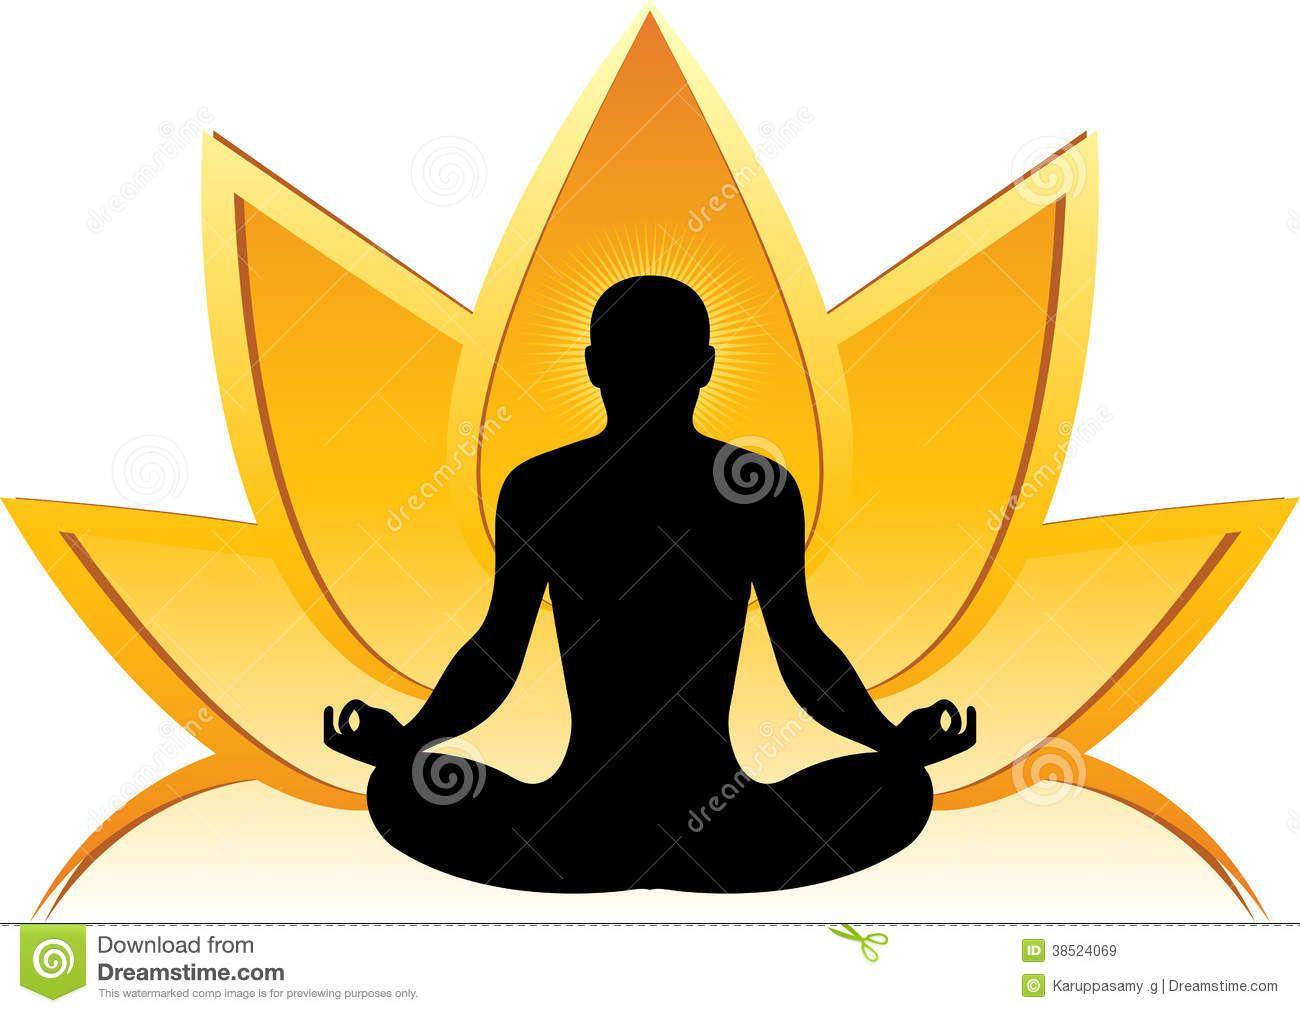 Image result for yoga logo | cv | Pinterest | Yoga logo and Logos